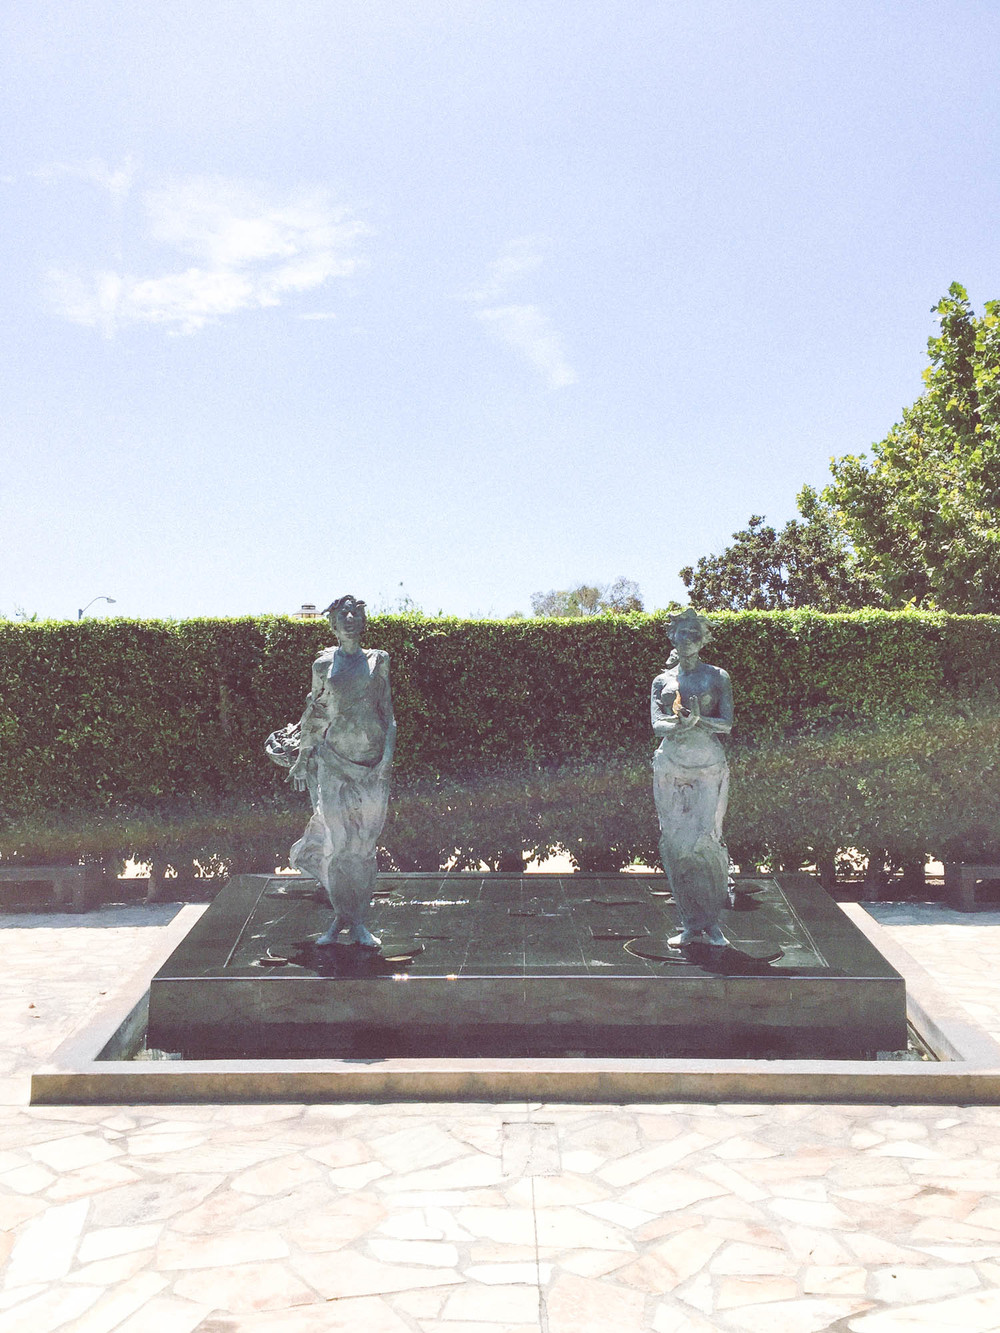 cerritos sculpture garden1.jpg